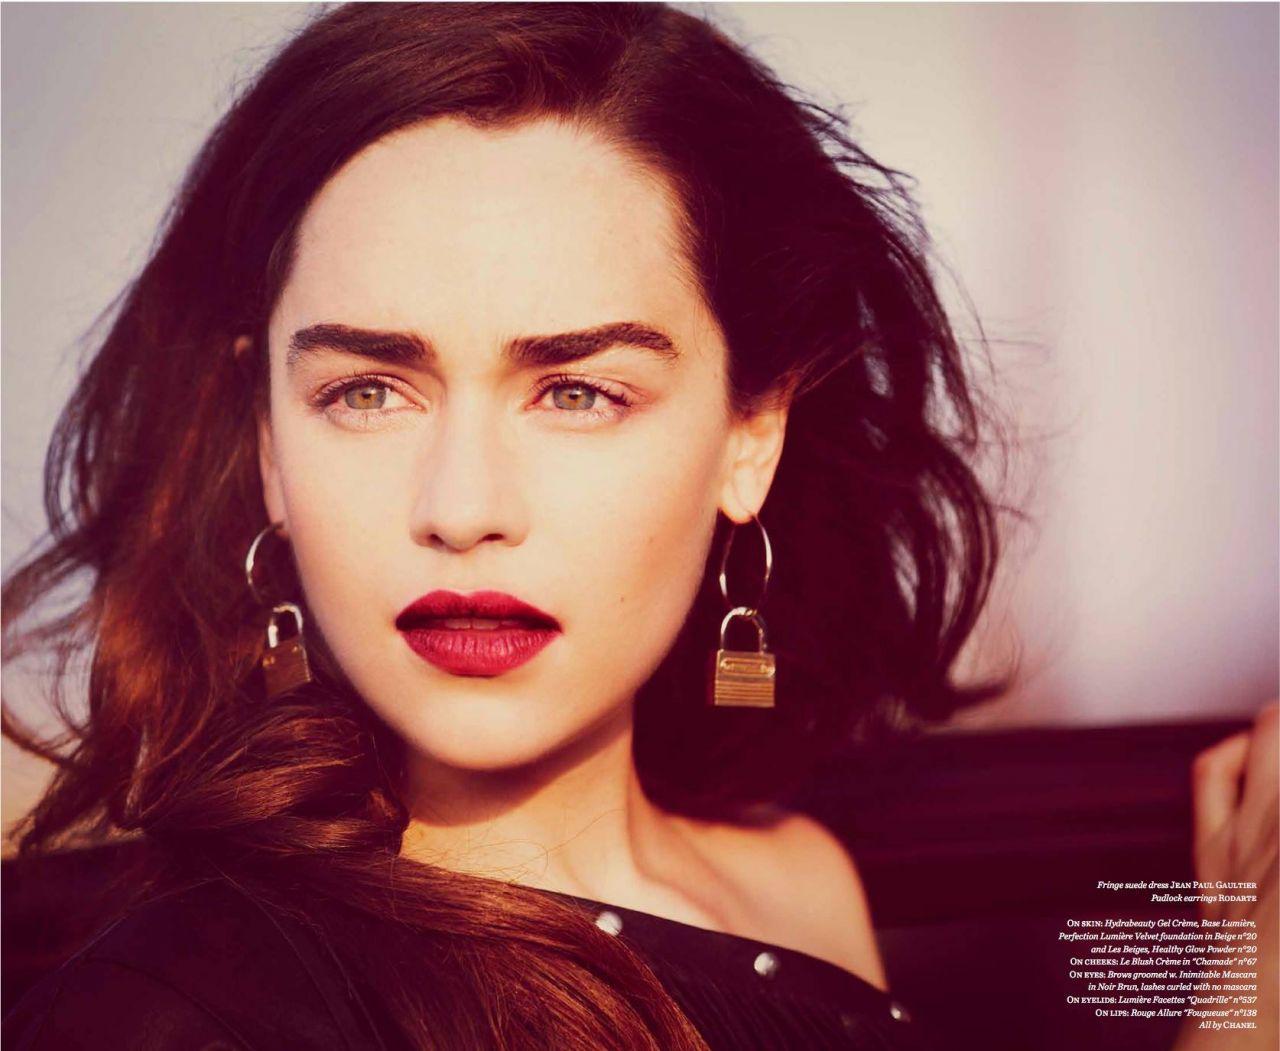 Game of Thrones /სამეფო კარის თამაში  - Page 12 Emilia-clarke-vs-magazine-spring-2014-issue_3